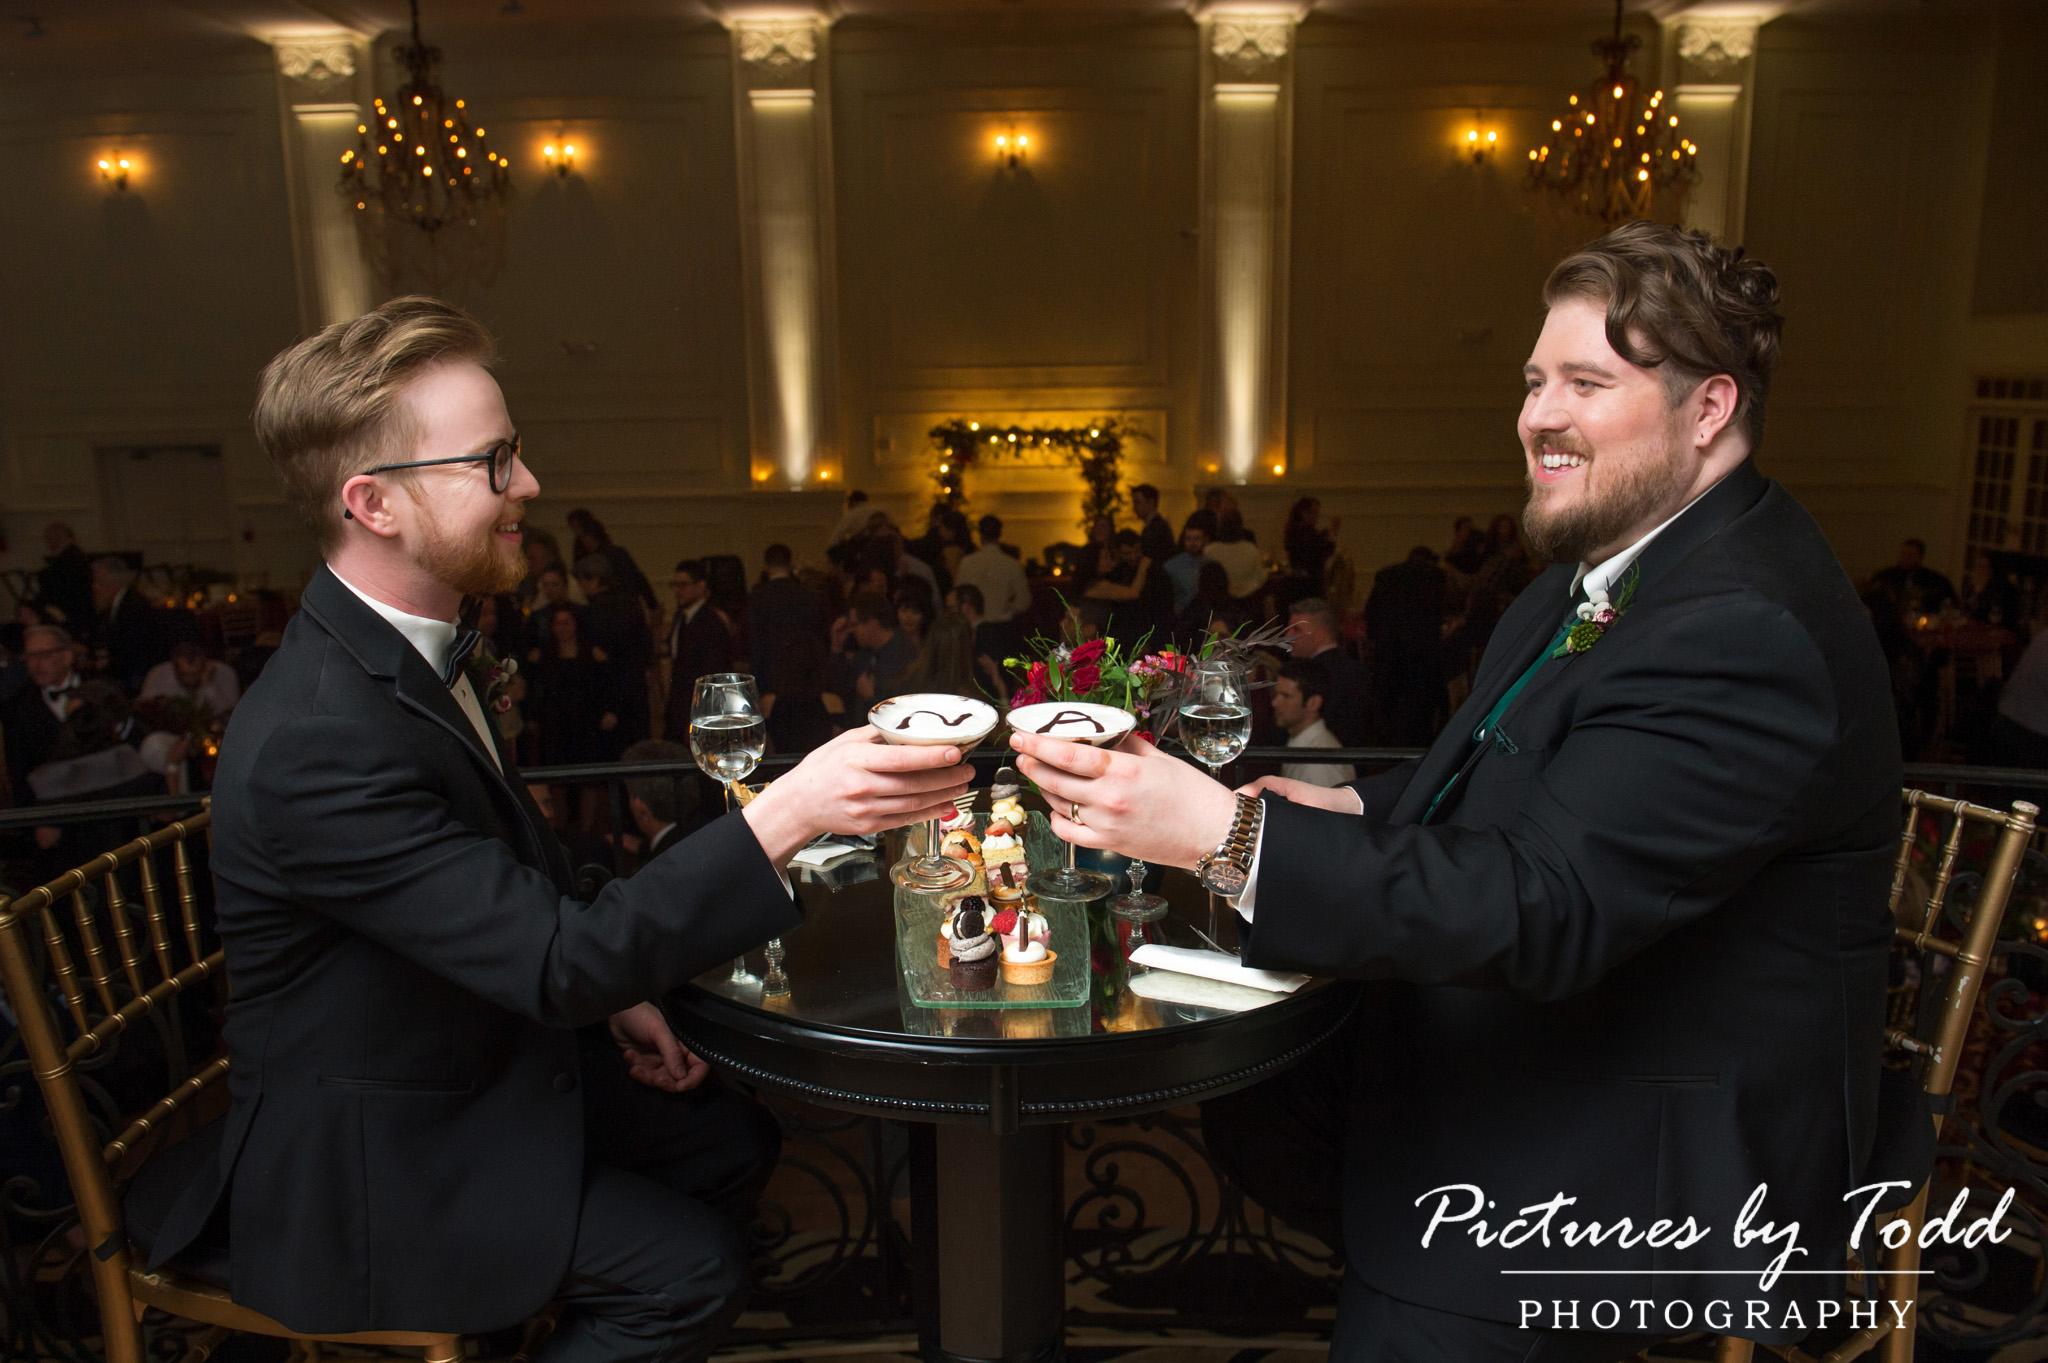 Andrew & Nicholas' Wedding | Cescaphe Ballroom